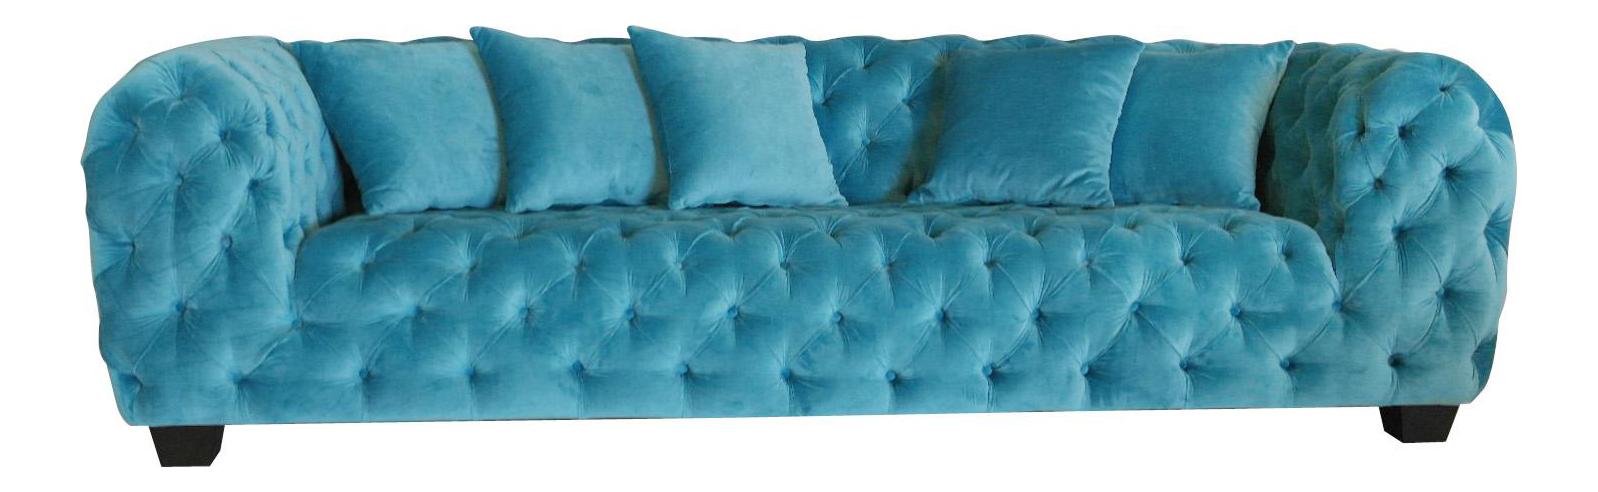 Beau Casa Milano Collection Blue Velvet Tufted Sofa